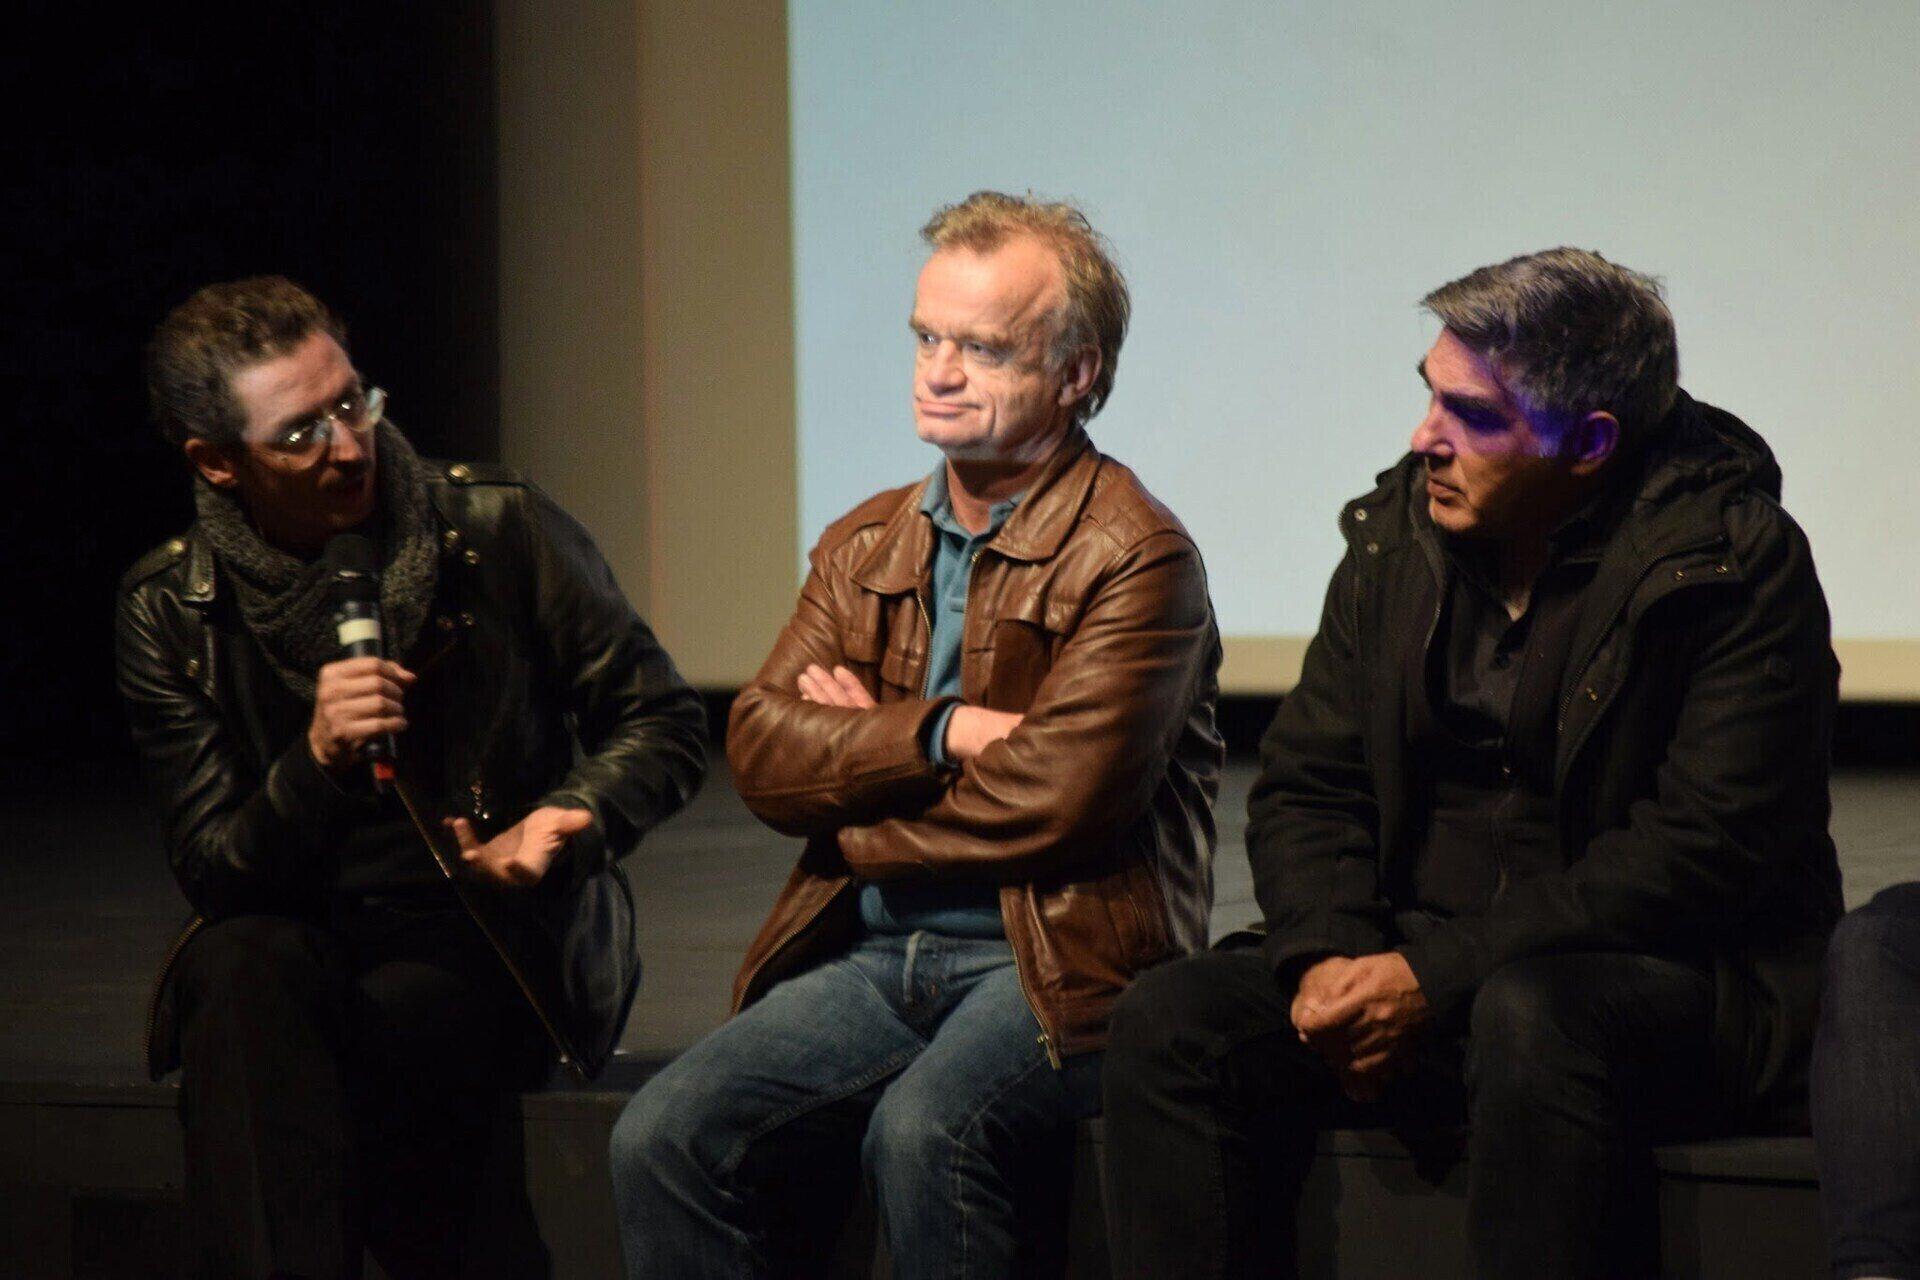 Paulo Furtado, Dominique Pinon, Edgar Pêra